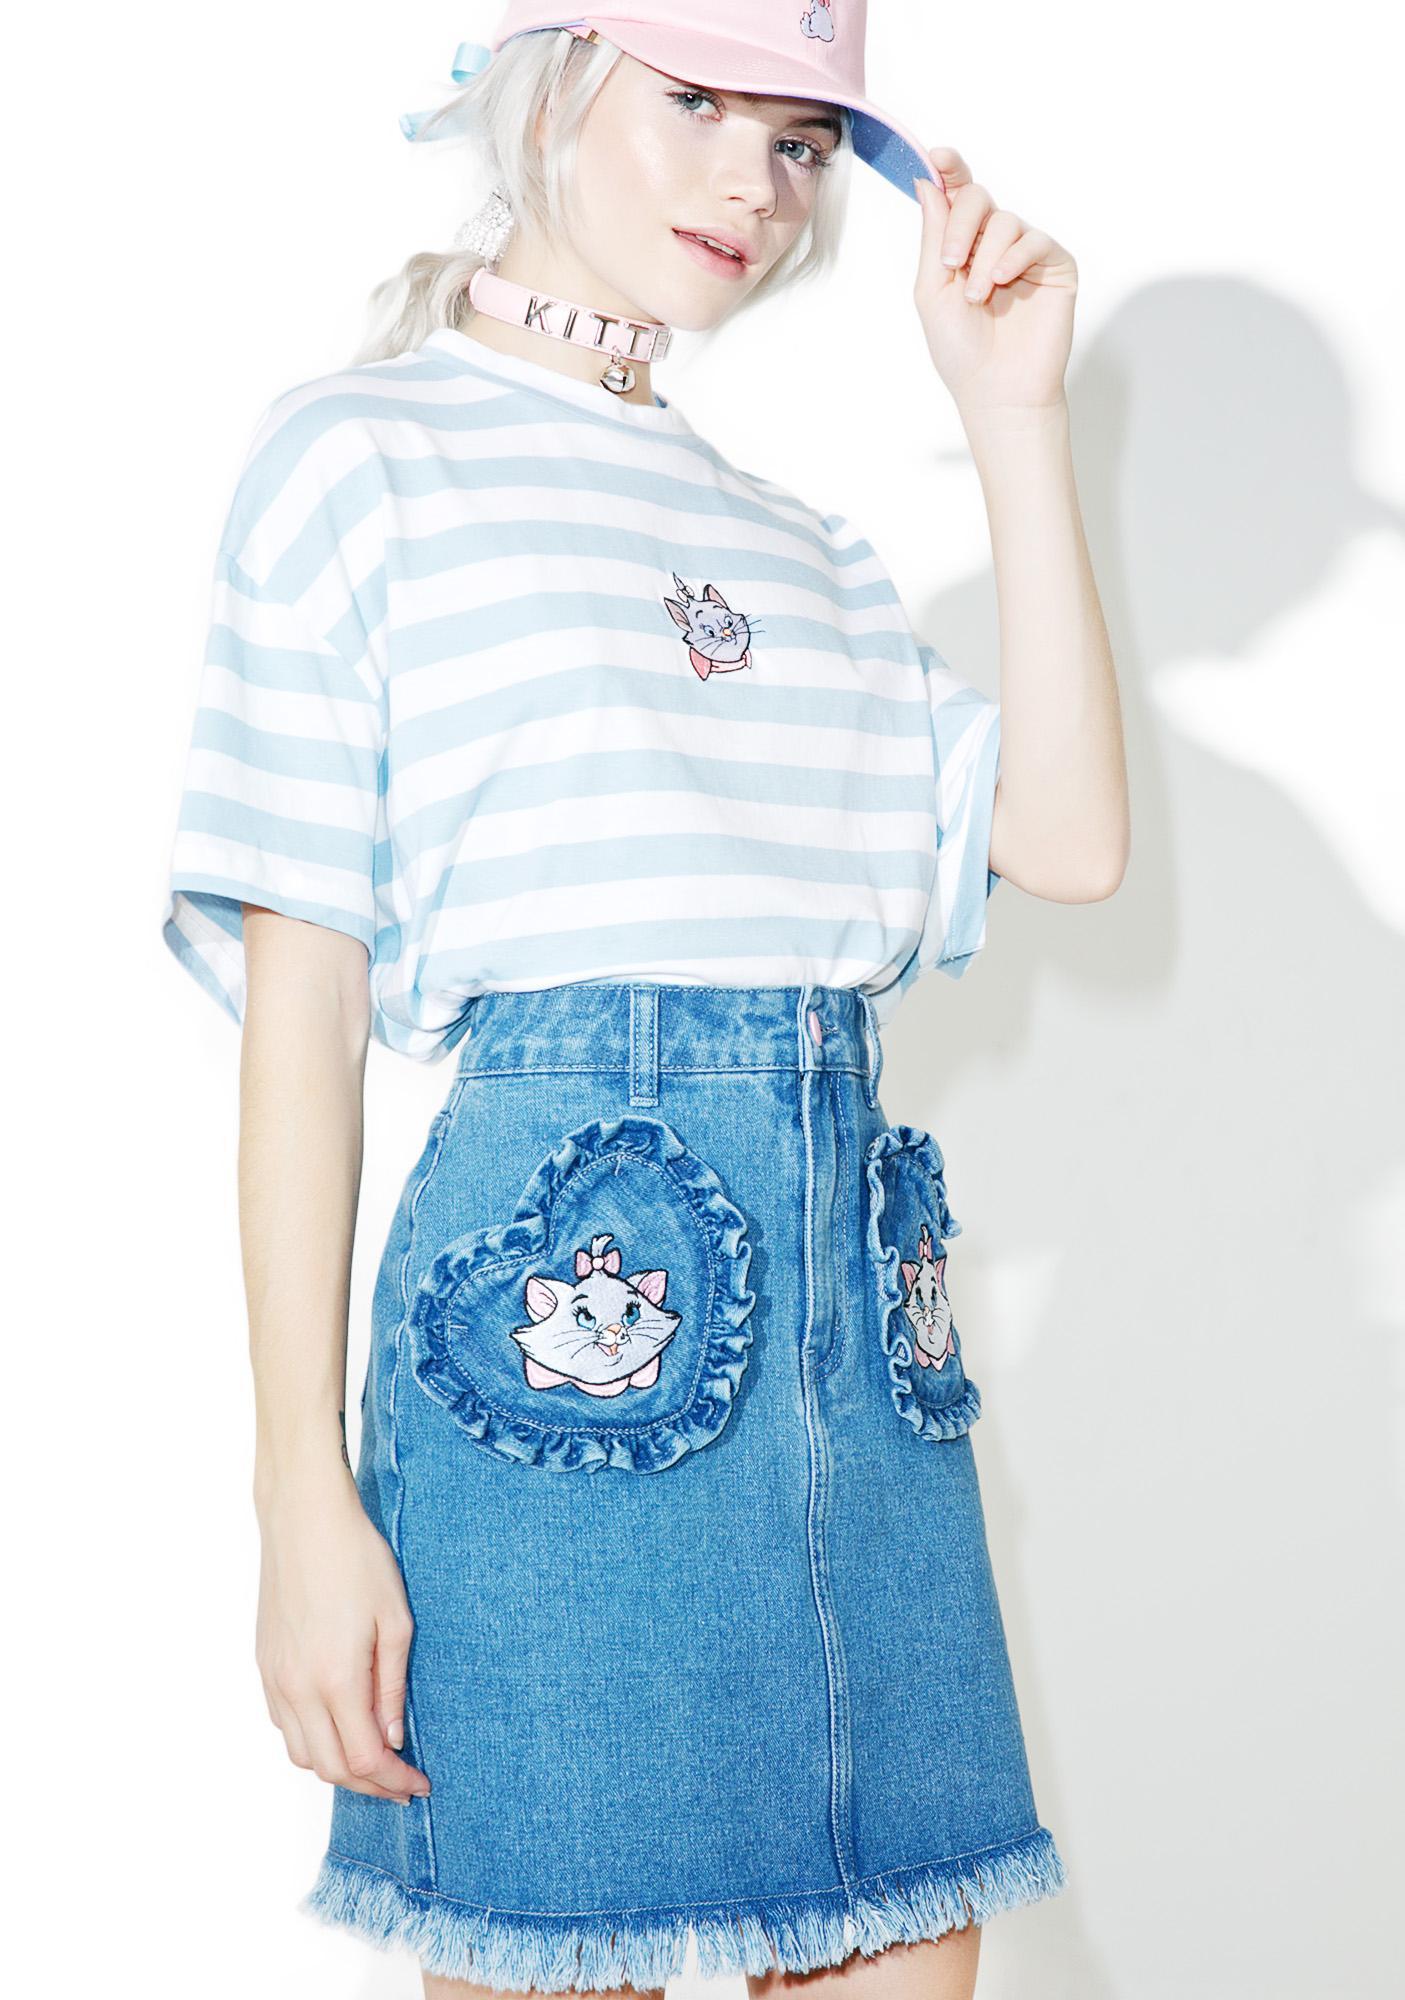 Lazy Oaf X Disney Aristocats Denim Skirt